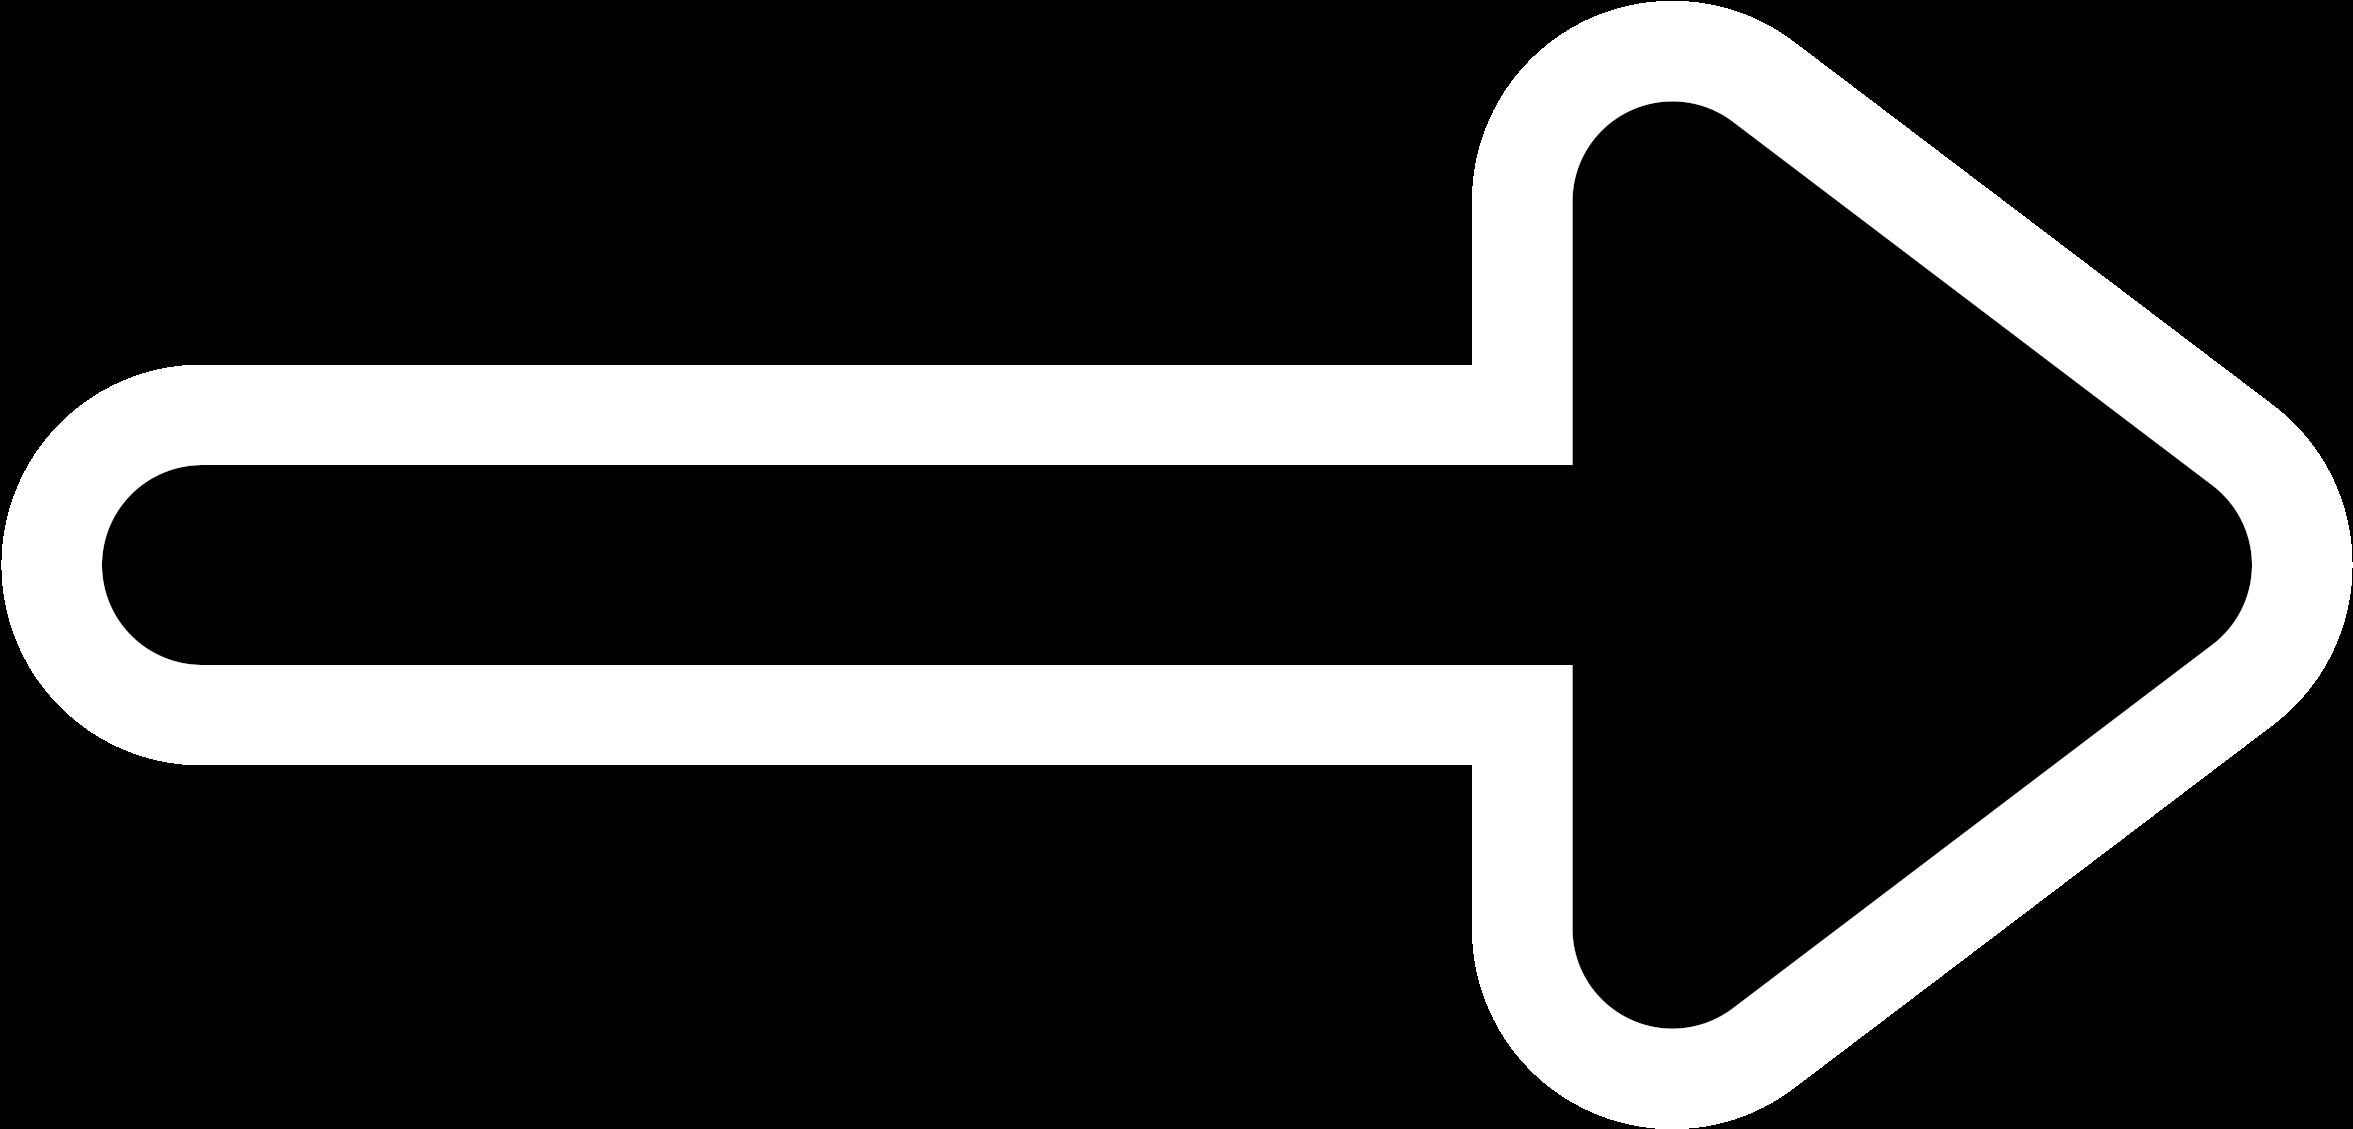 Clipart arrows end. Hd line with arrow